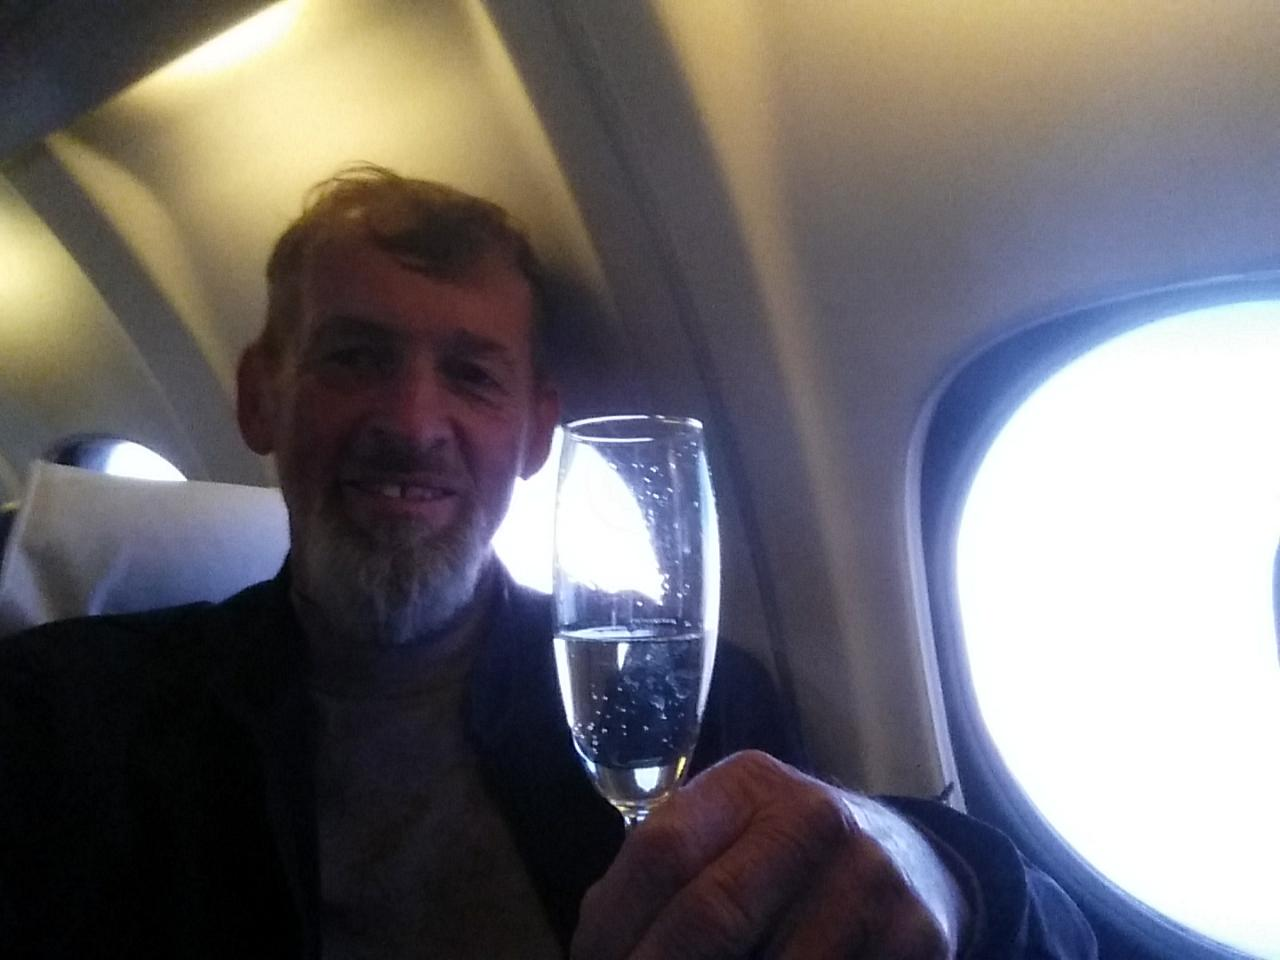 2018-10-07 Everest flight-Yeti Airlines 33_1538881466500_22.JPG